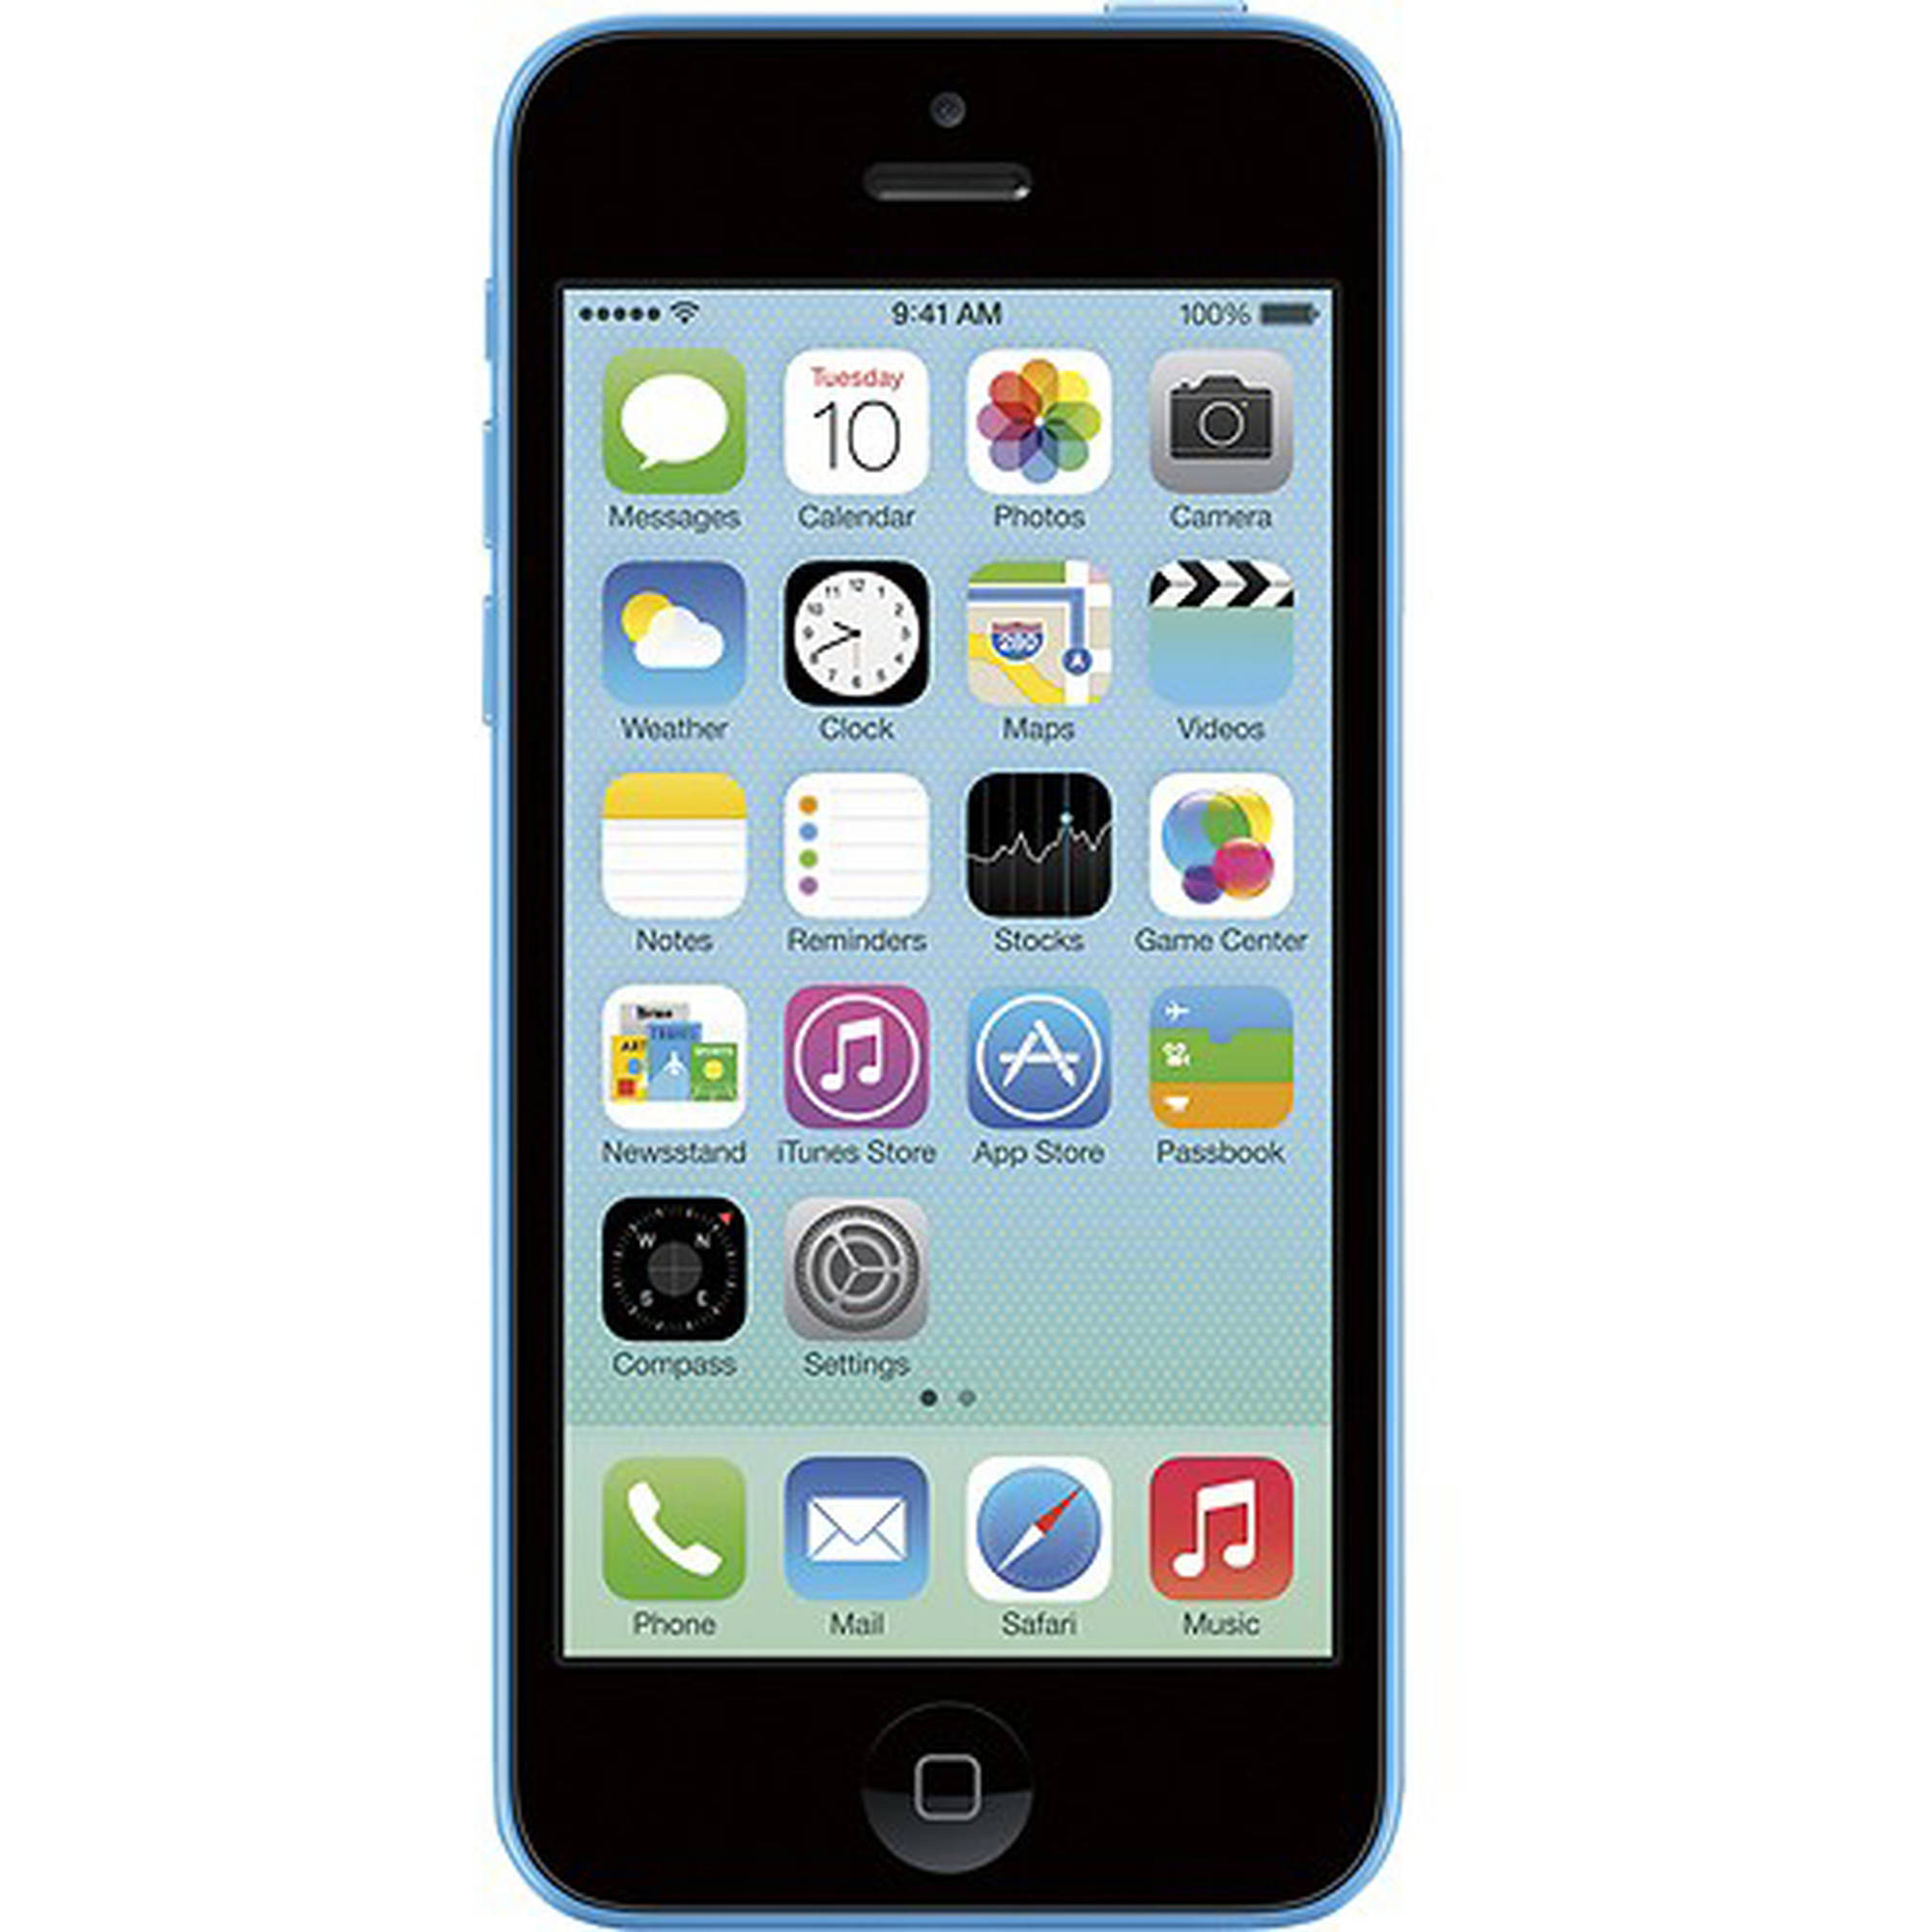 Refurbished Apple iPhone 5c 8GB, Blue - Unlocked GSM